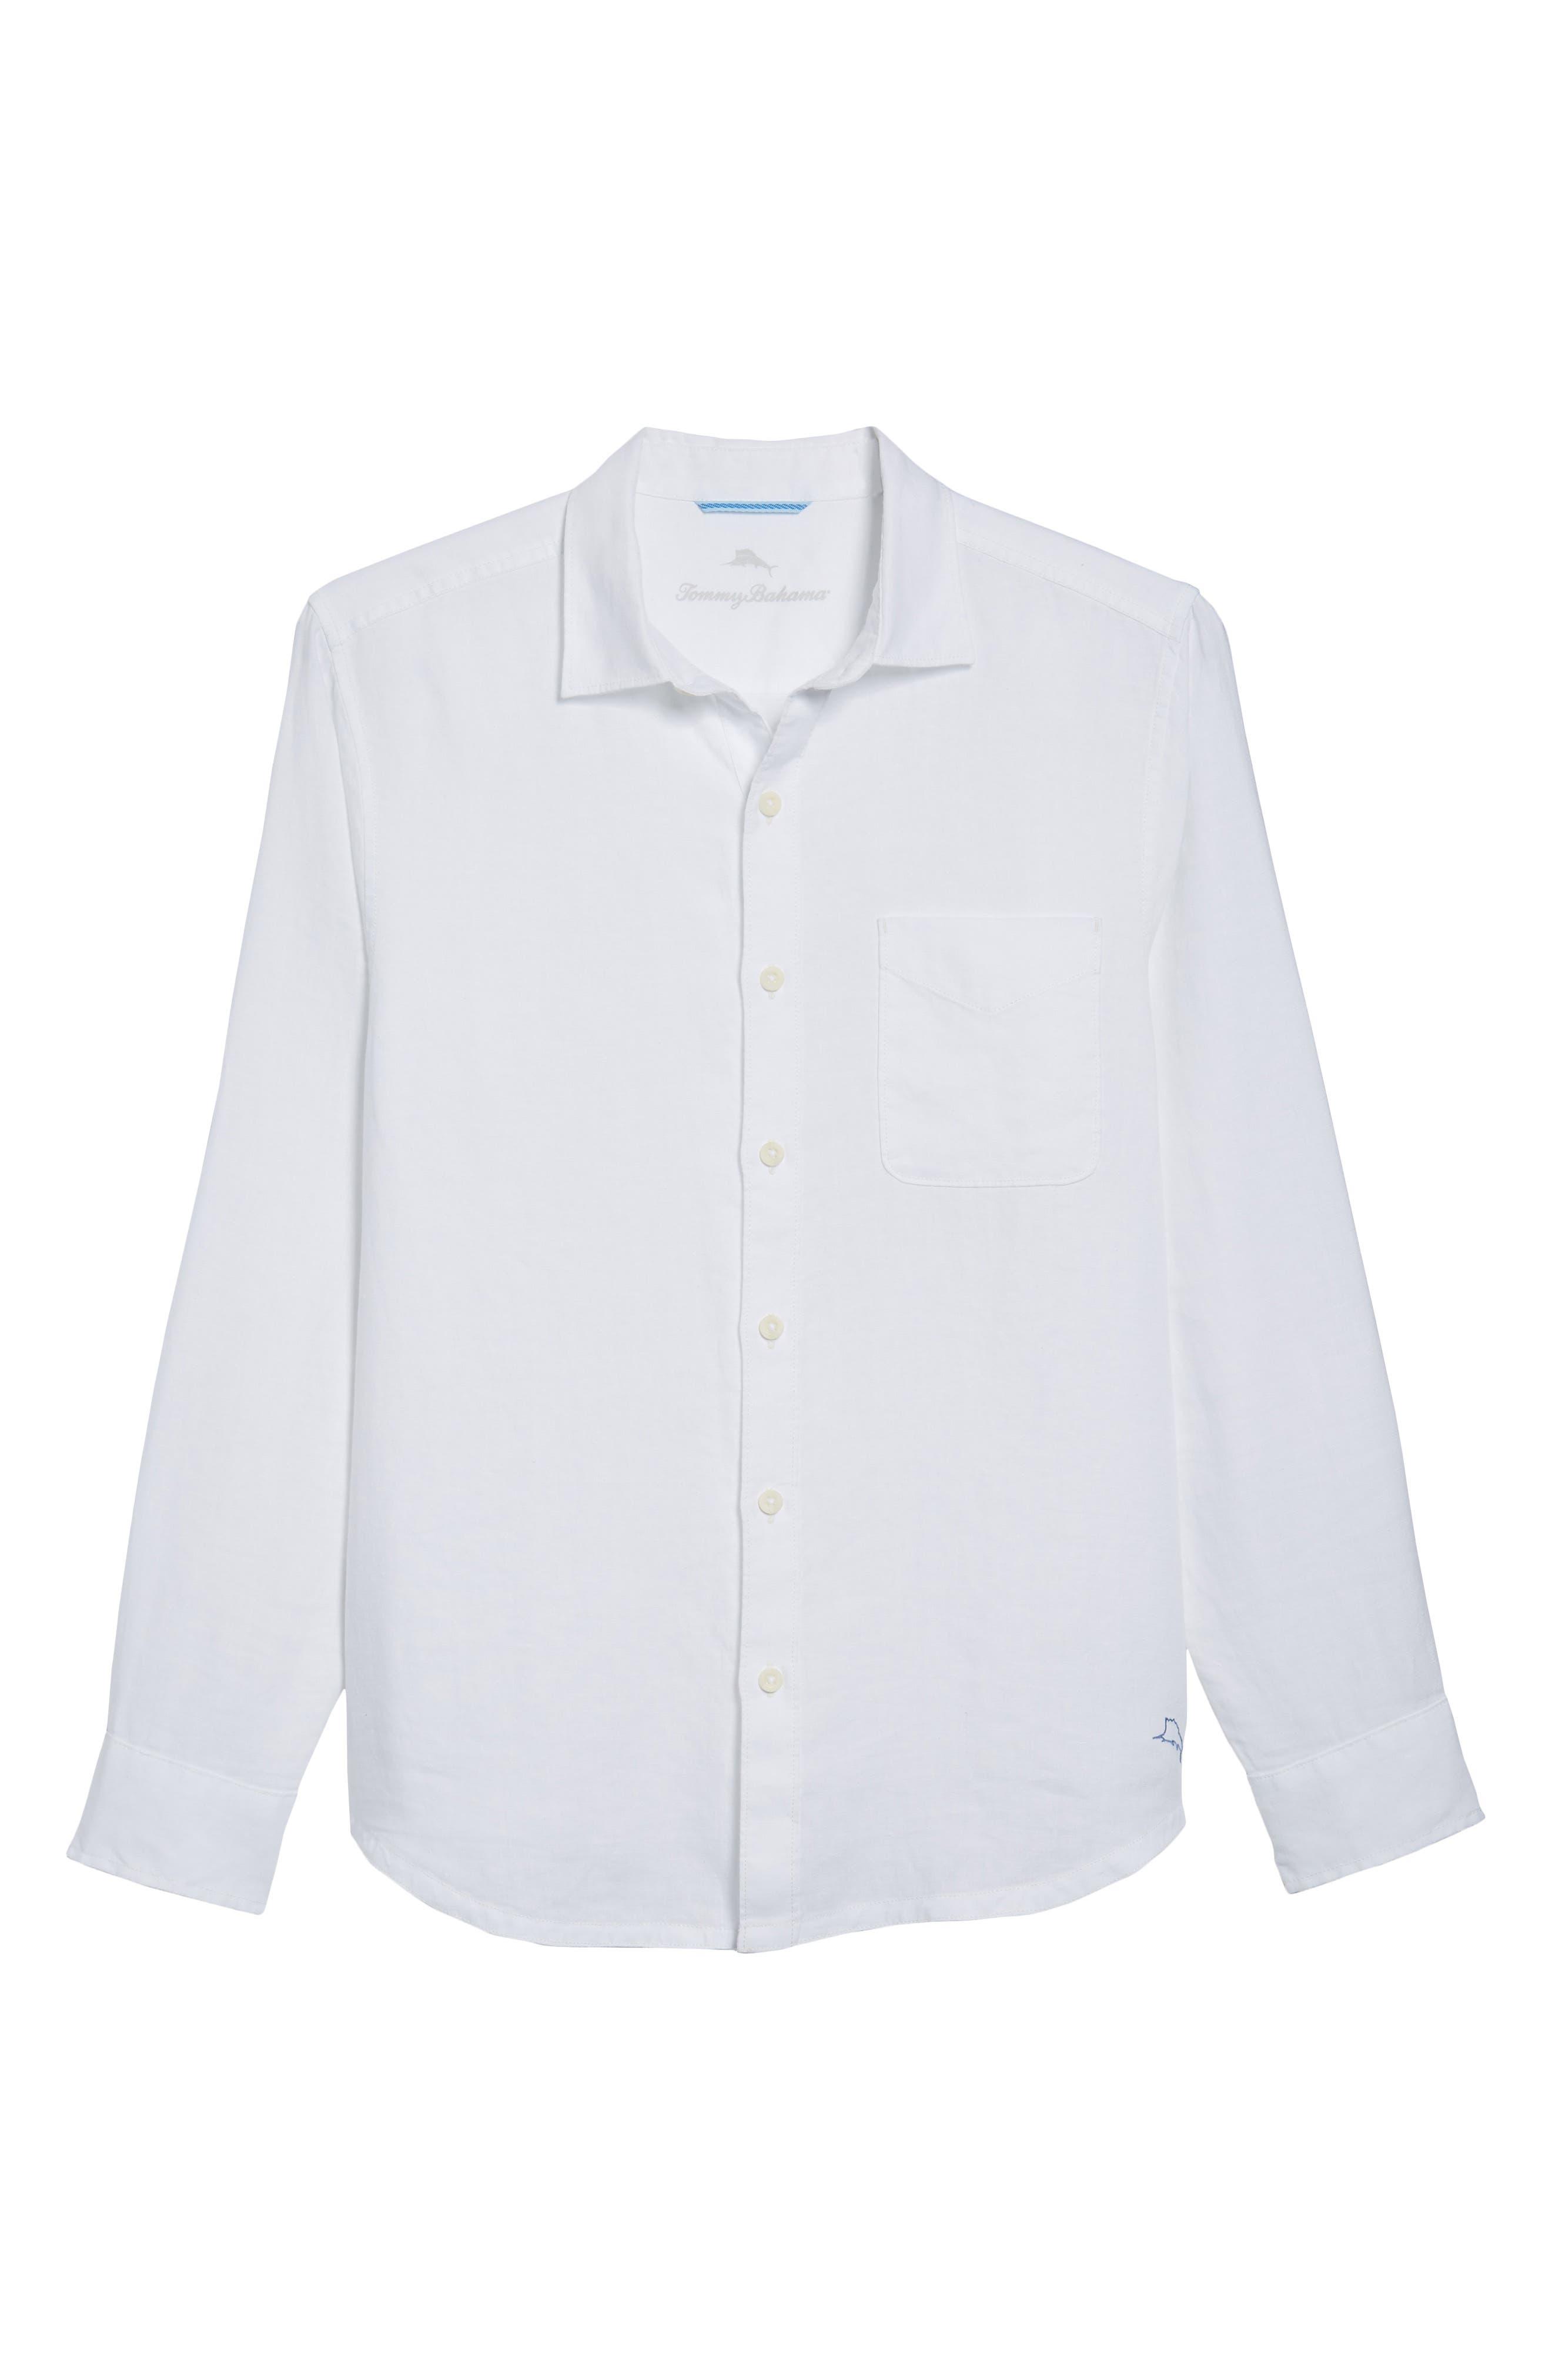 Seaspray Breezer Linen Shirt,                             Alternate thumbnail 21, color,